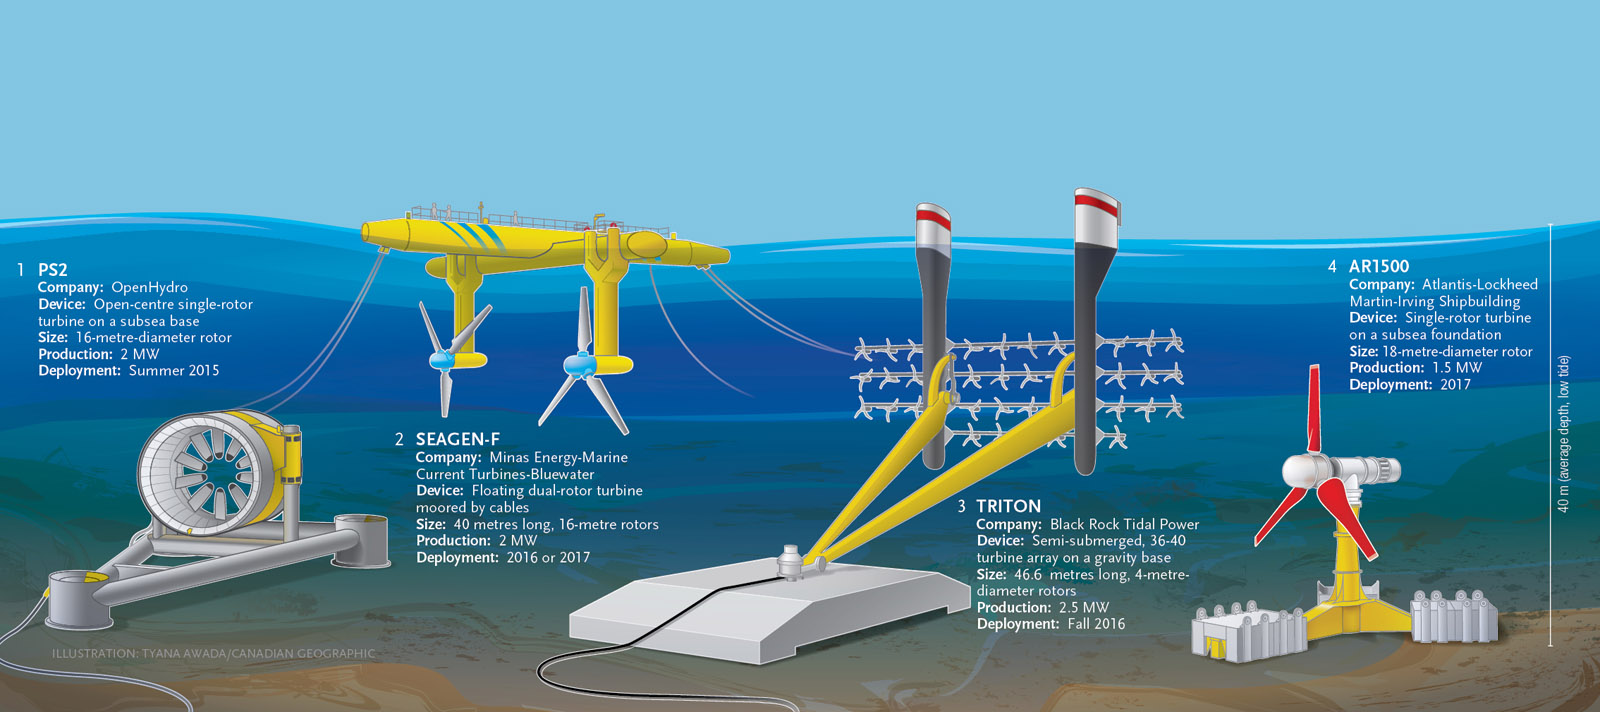 nova scotia s first in stream tidal turbine starts producing power